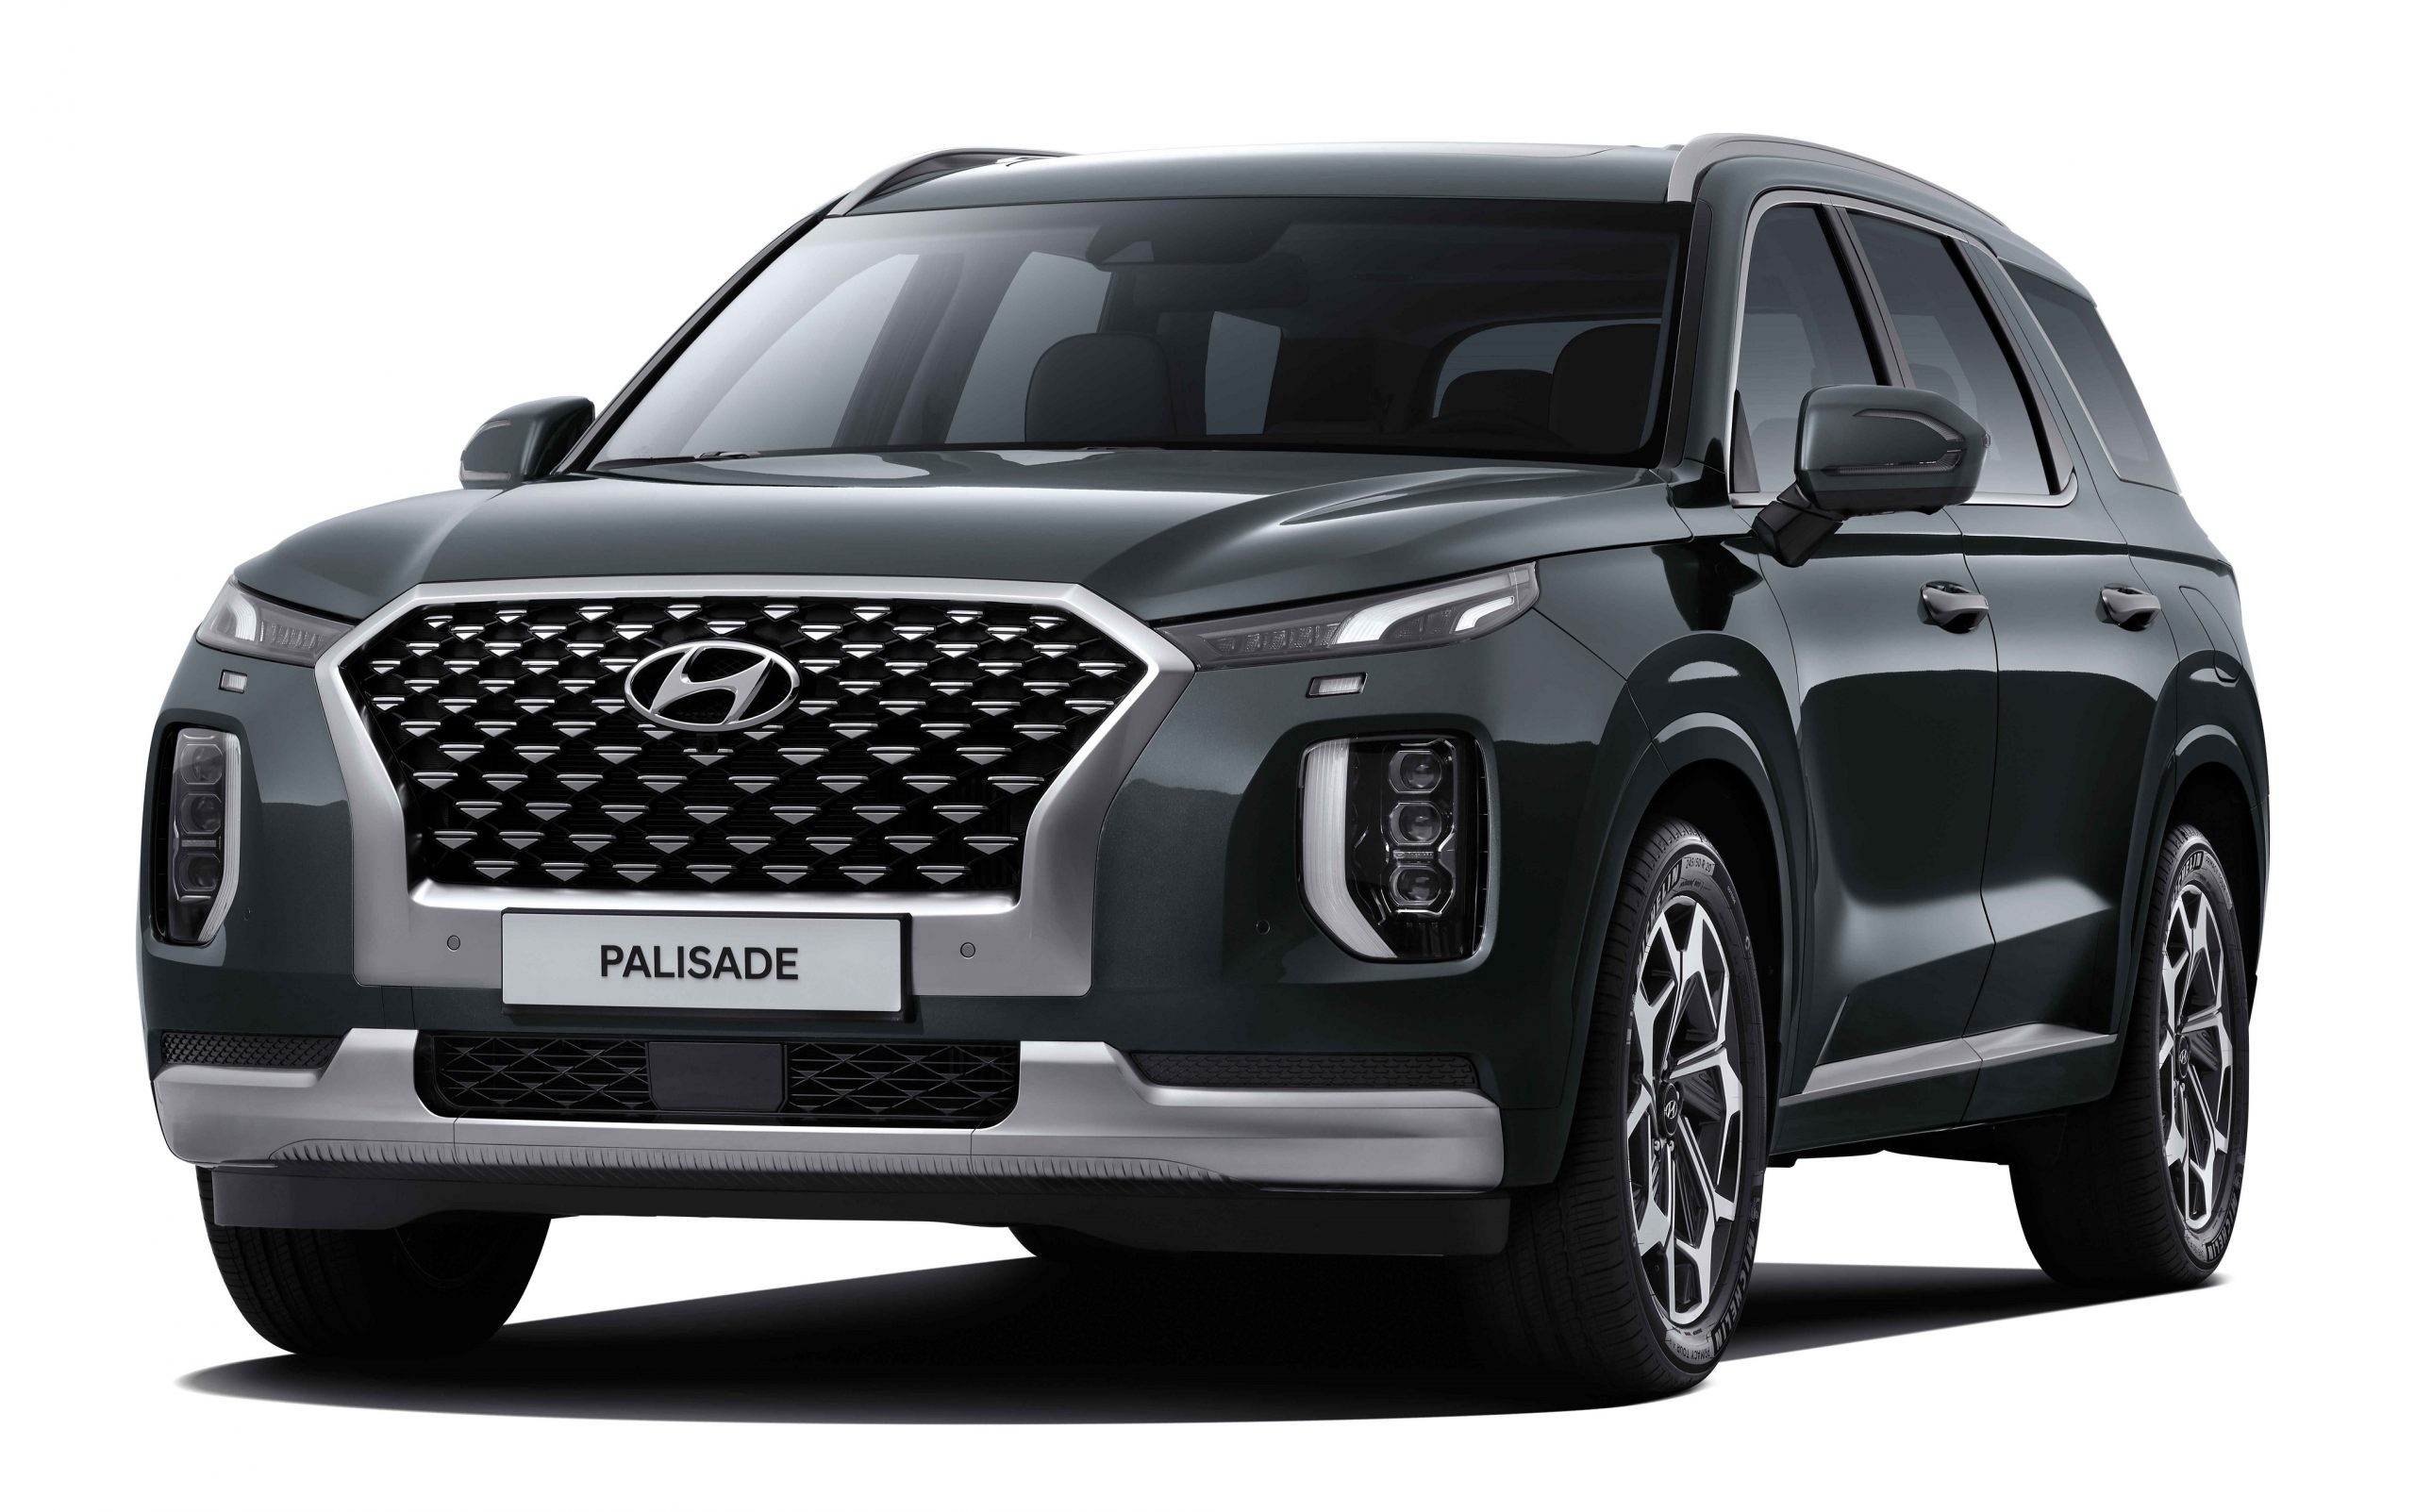 Hyundai, Kia U.S. sales jump 76 pct on SUVs in March